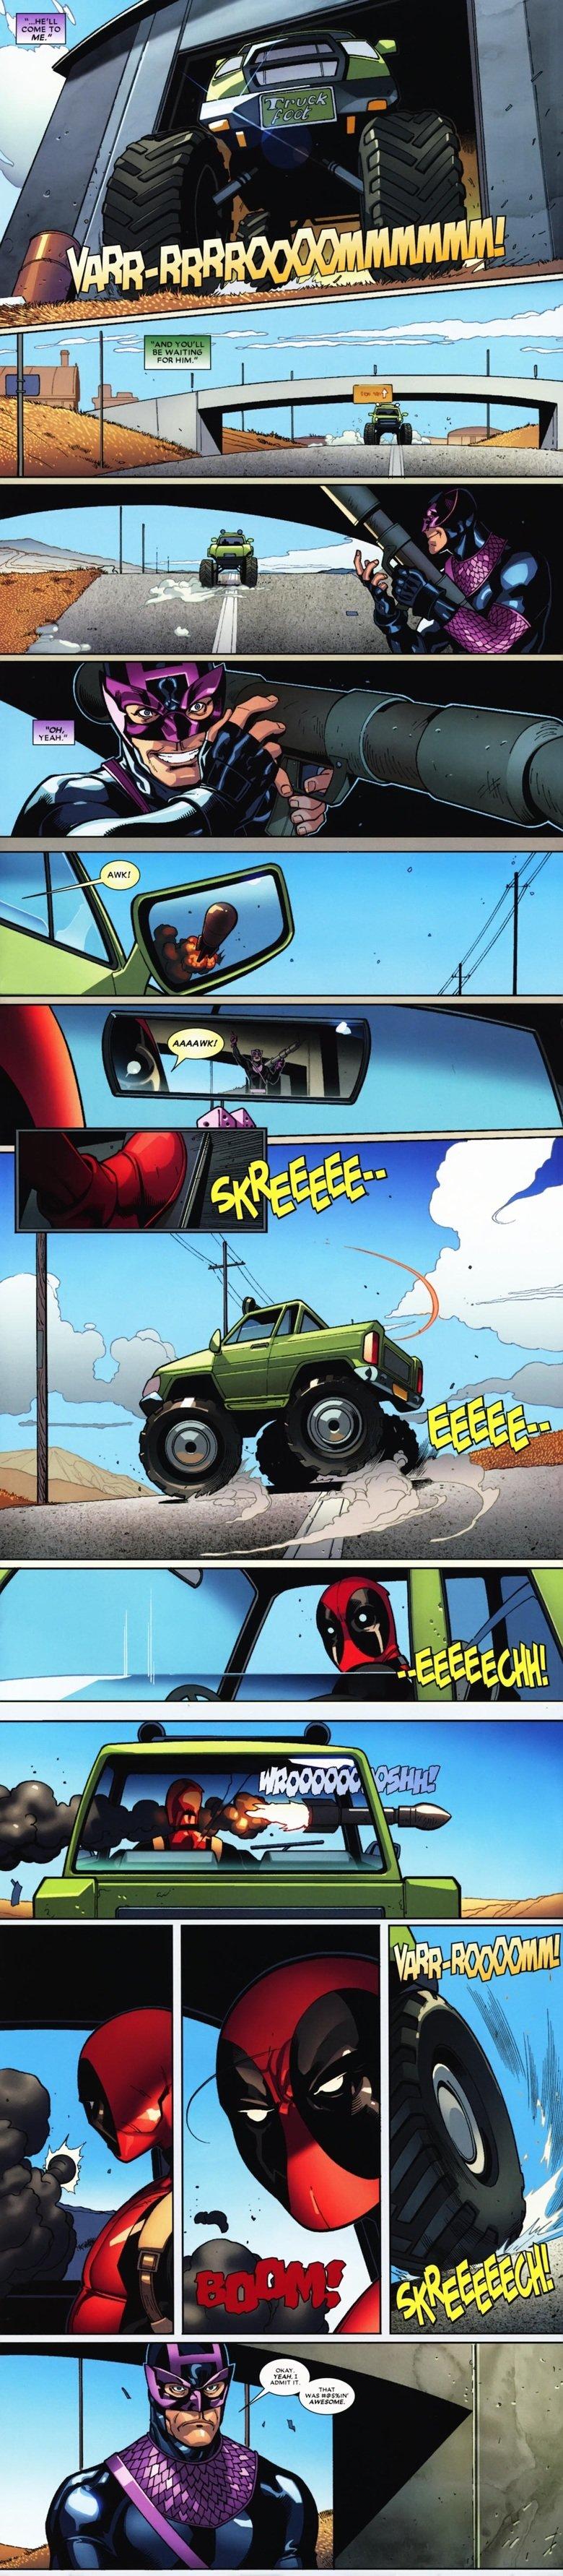 Bullseye ain't got shit on Deadpool. . Deadpool being a